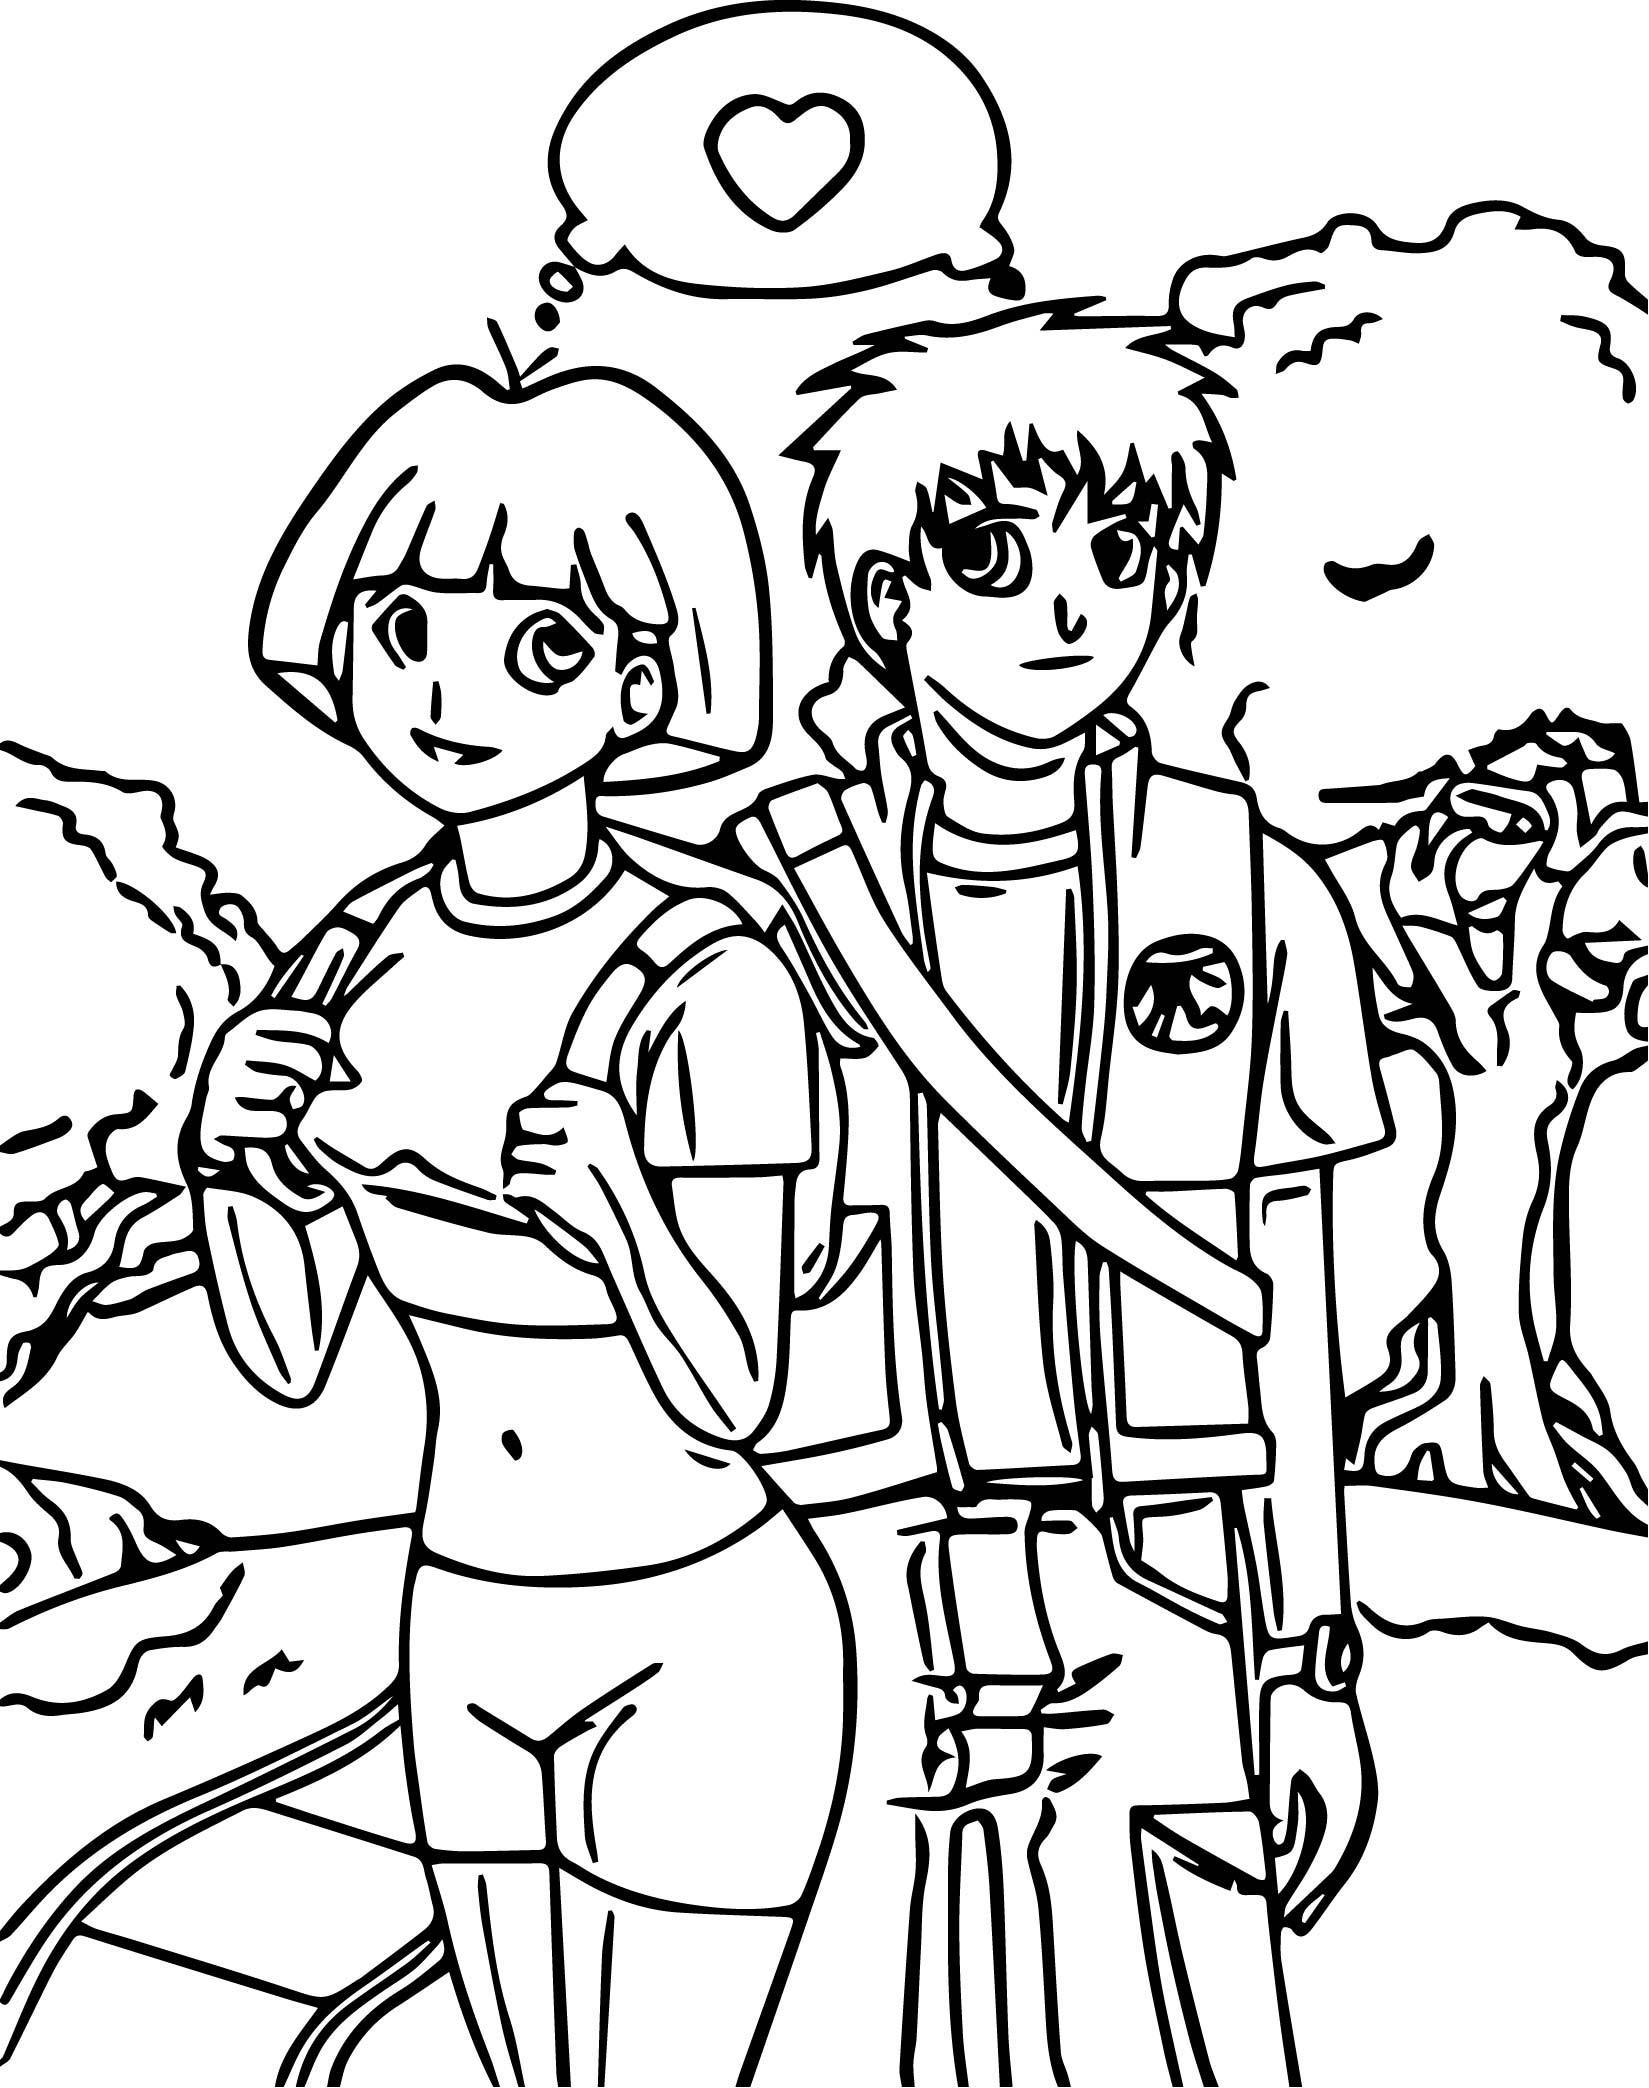 Dora The Explorer Coloring Page 54